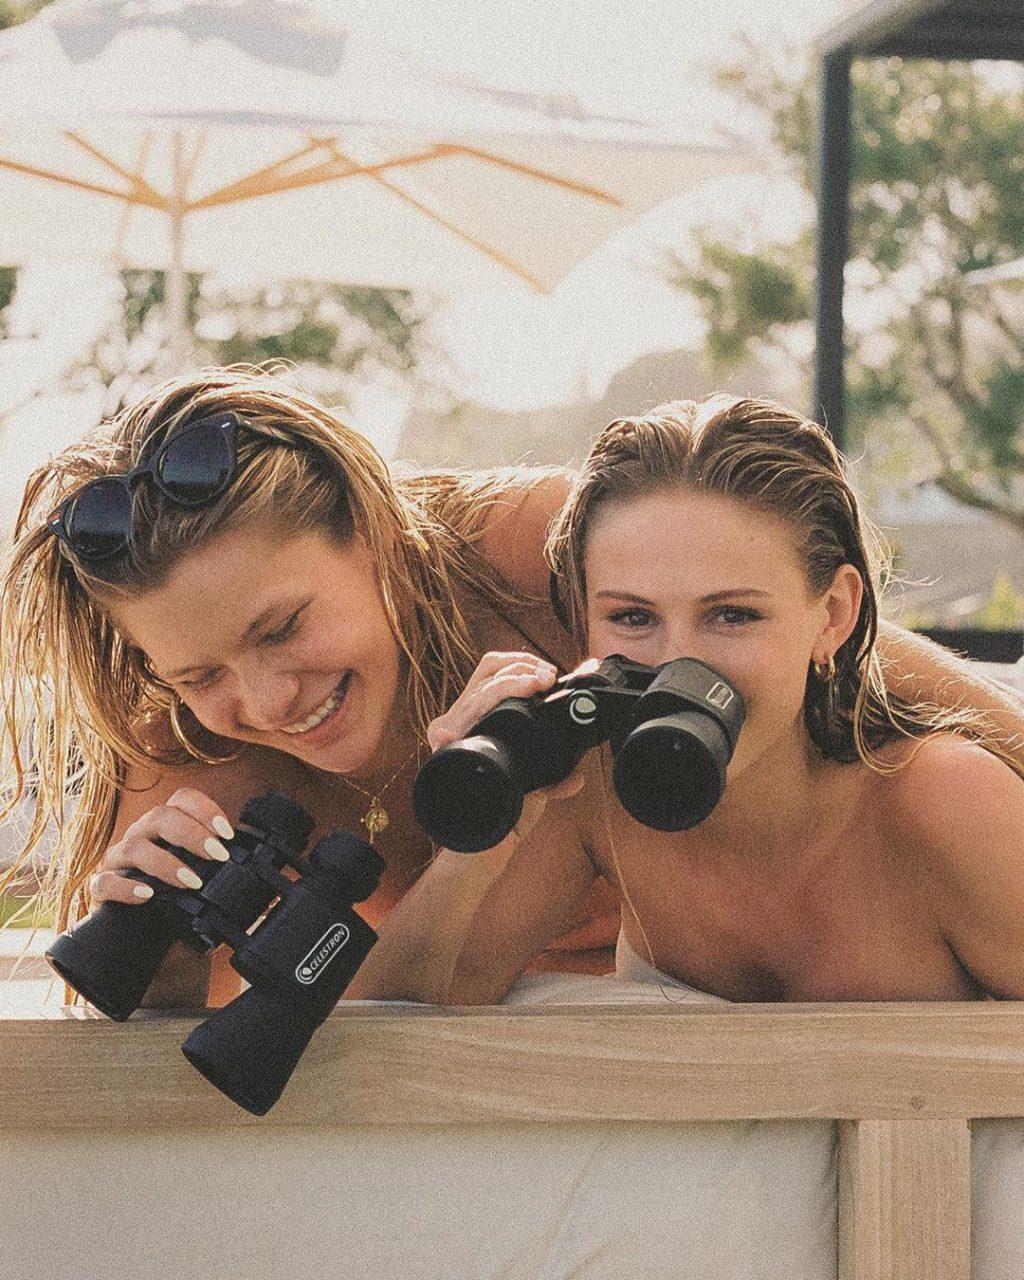 Josie Canseco & Scarlett Leithold See-Through